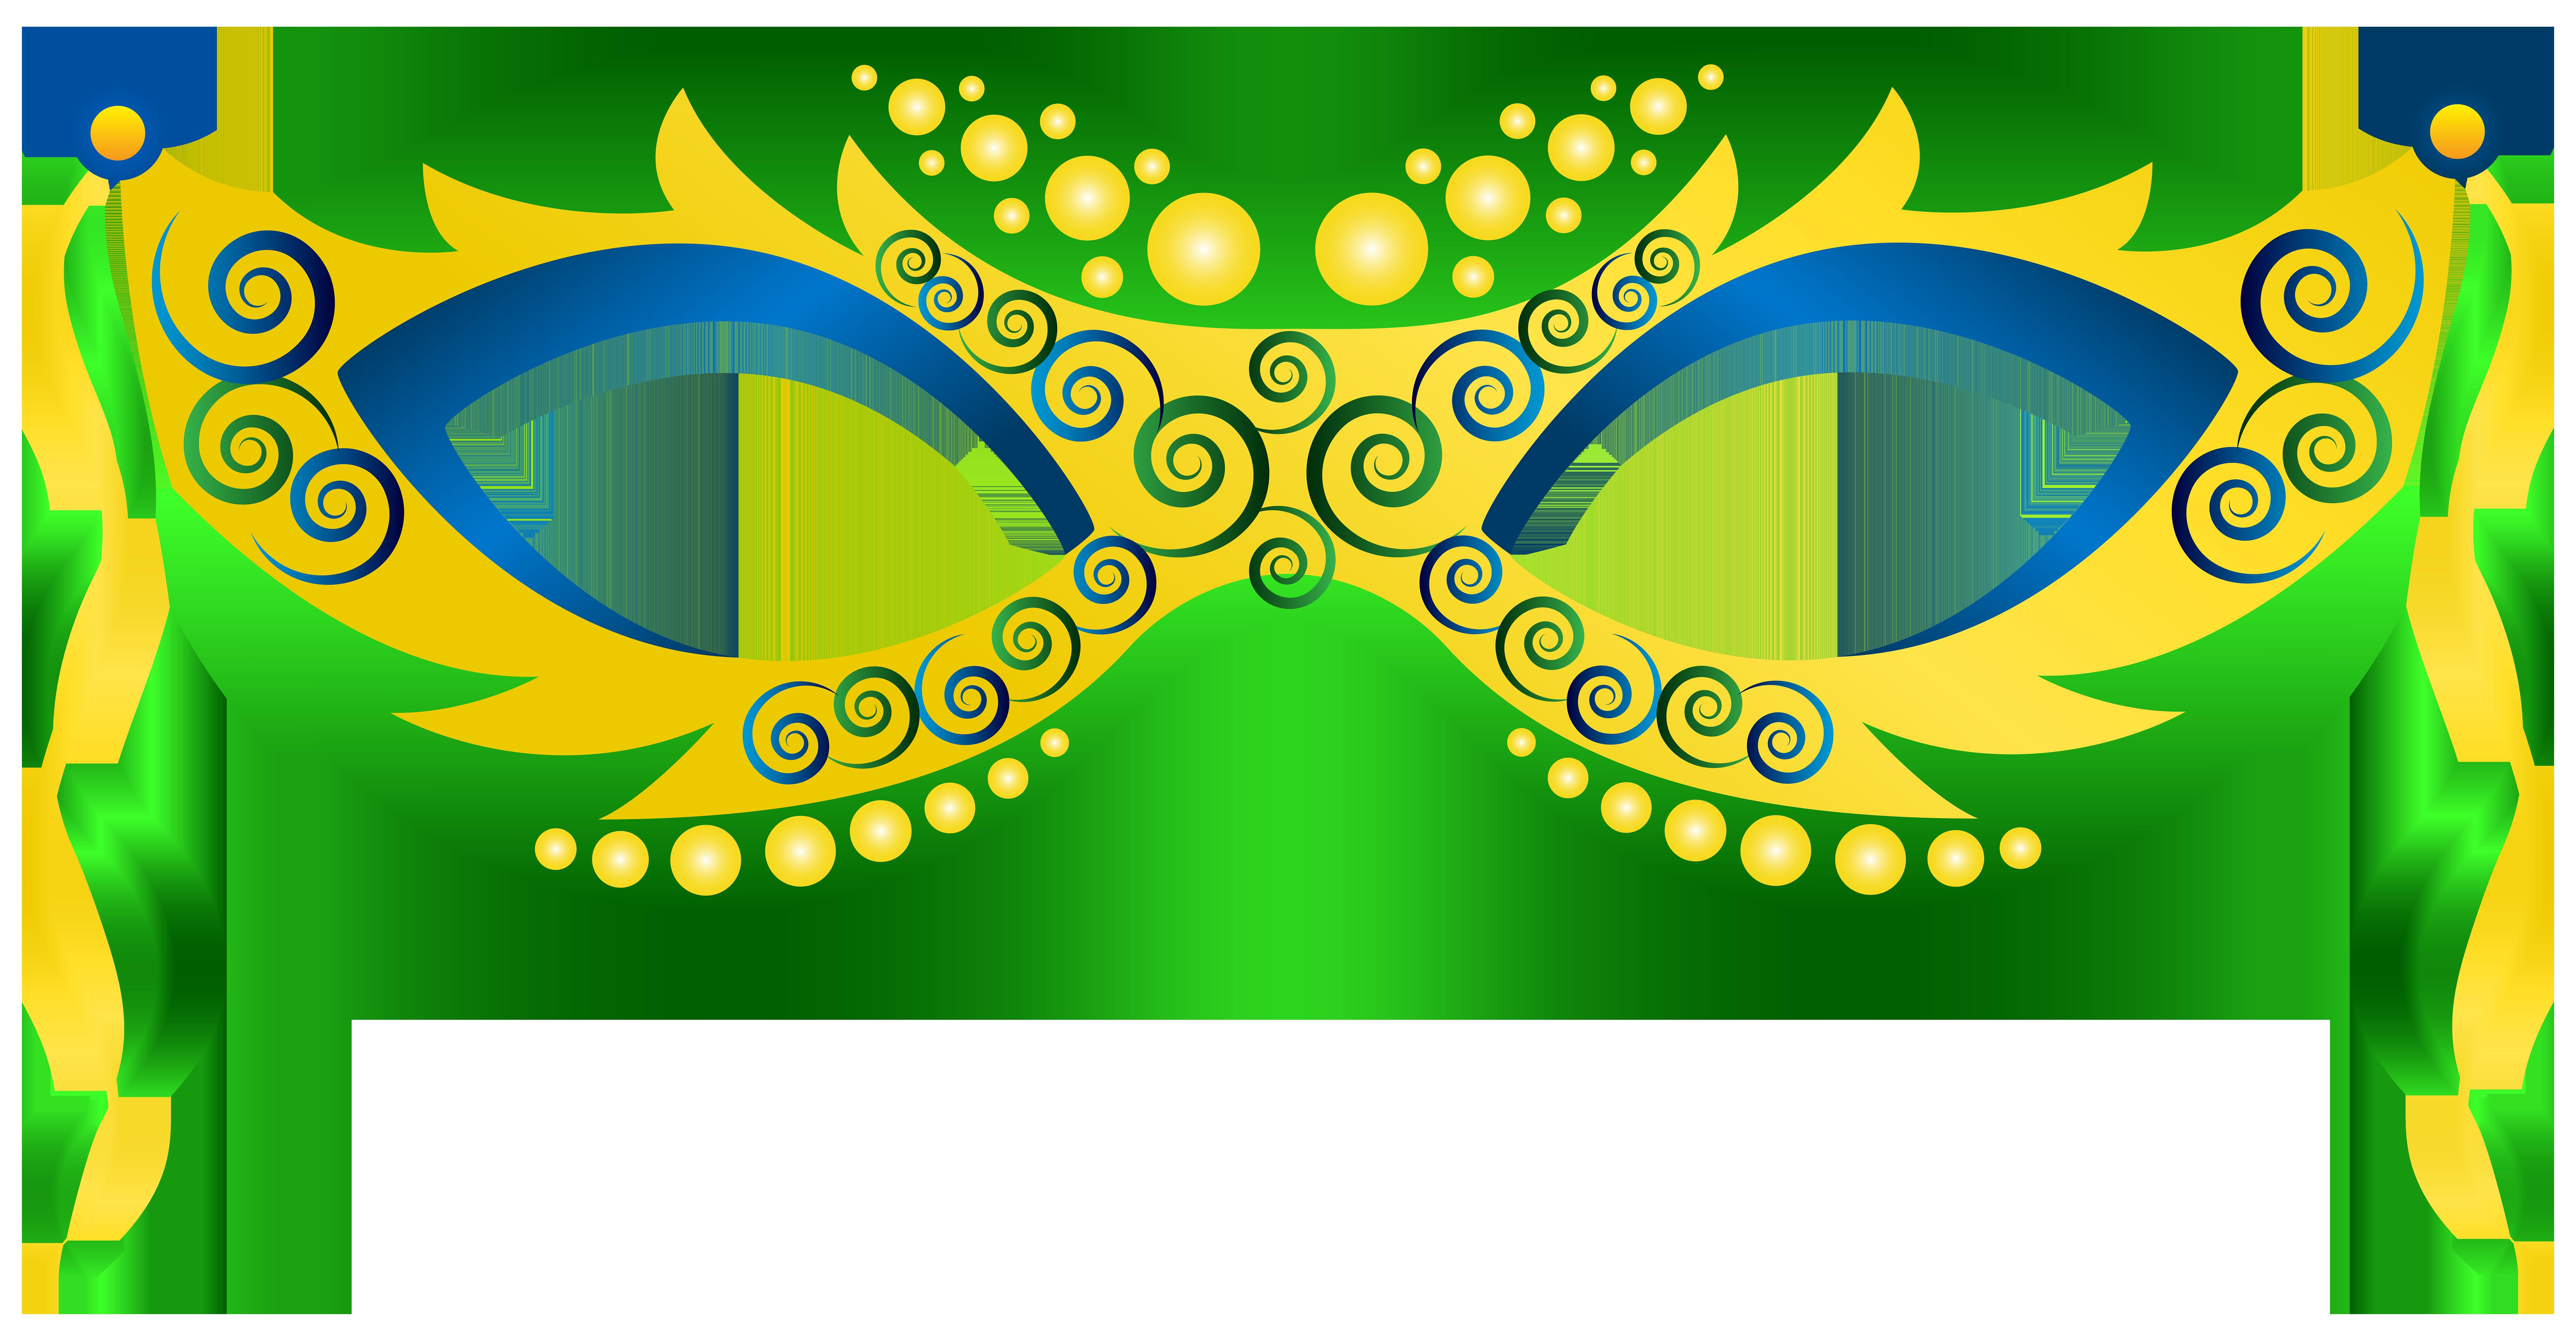 Green Yellow Carnival Mask PNG Clip Art Image.